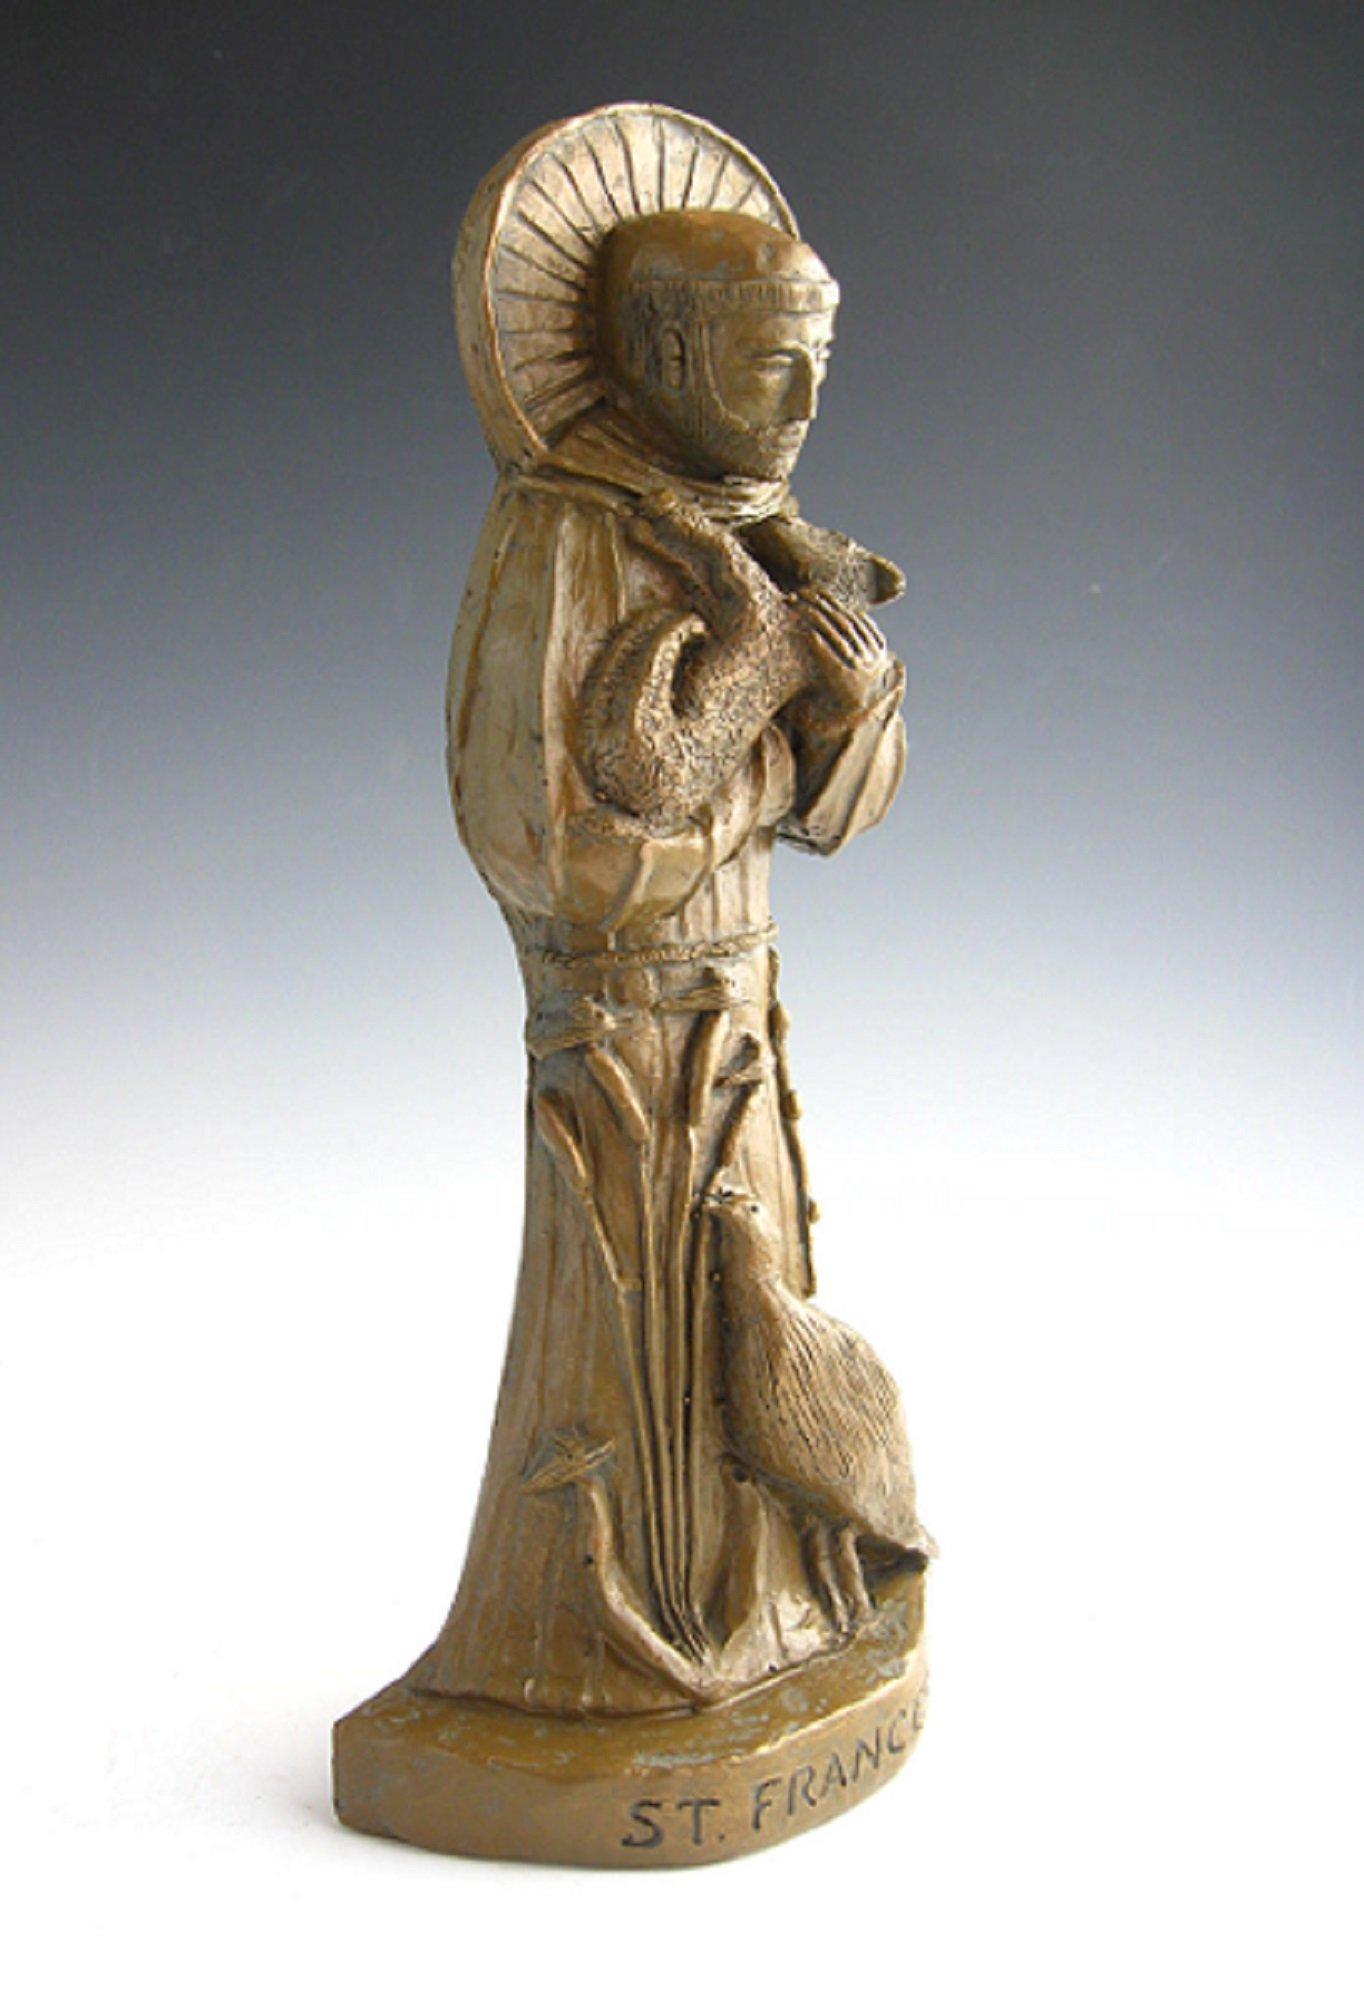 St. Francis, Patron of Nature: Handmade Statue